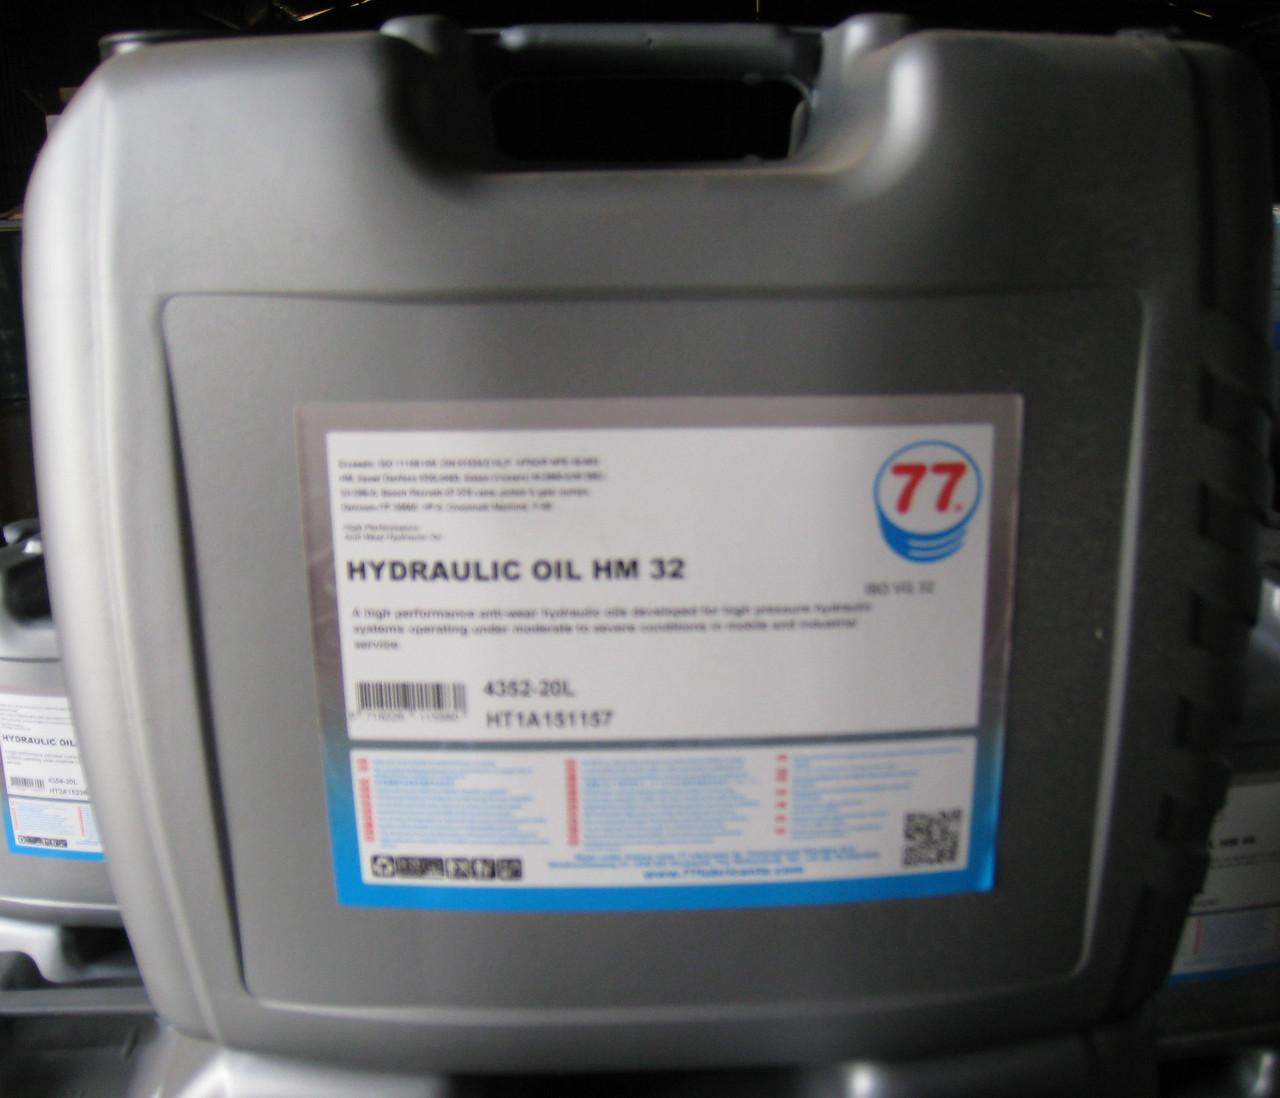 Гидравлическое масло HYDRAULIC OIL HM 32,   DIN 51524/2 HLP,   ISO VG 32  (кан. 20 л)